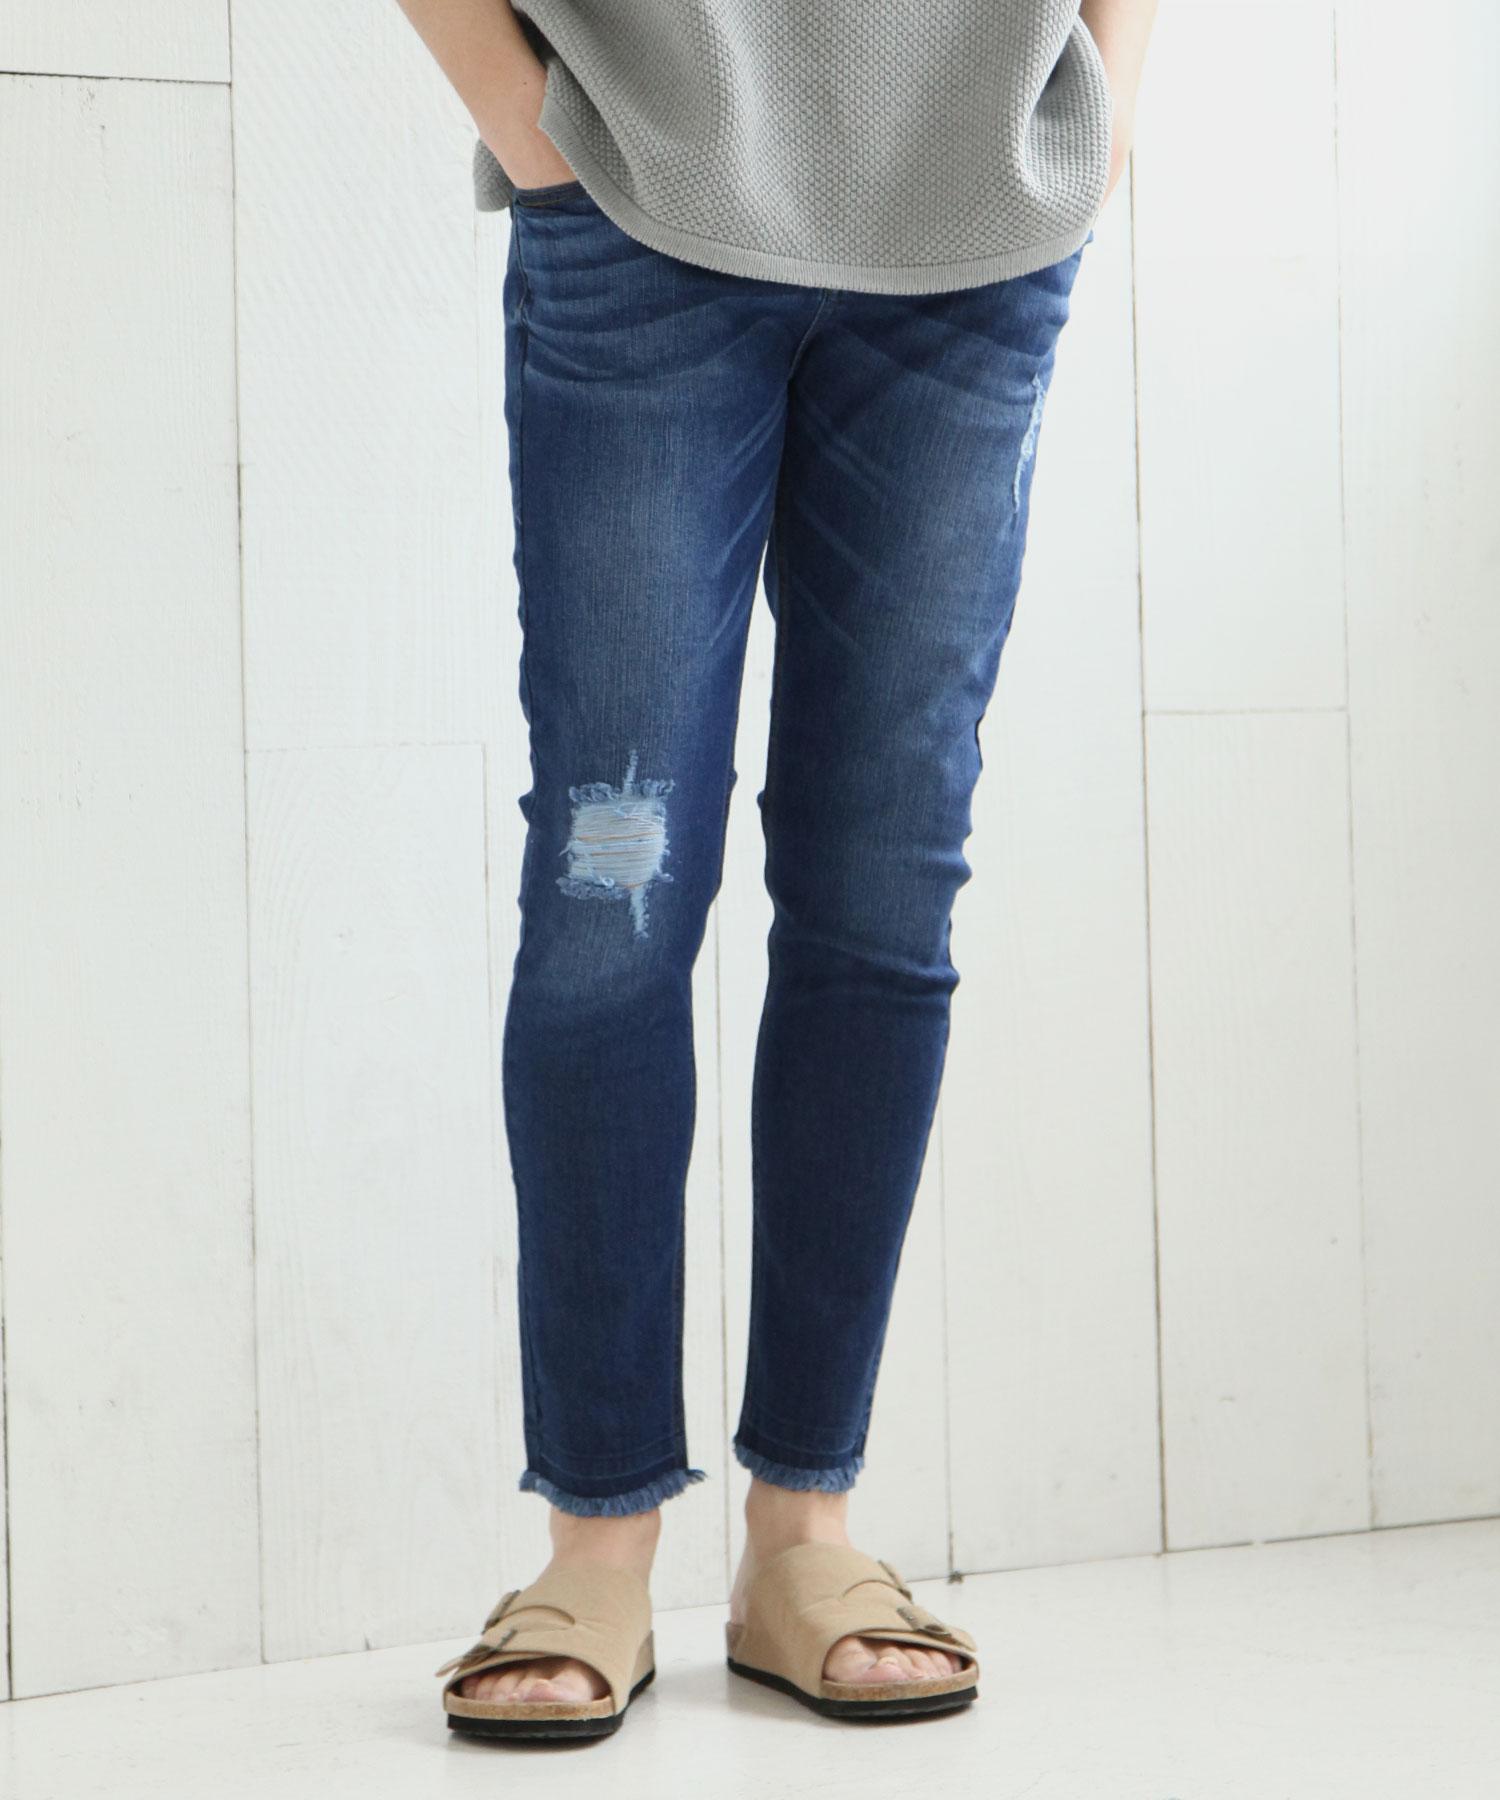 【Nilway】彈力窄管牛仔褲 破壞加工 2